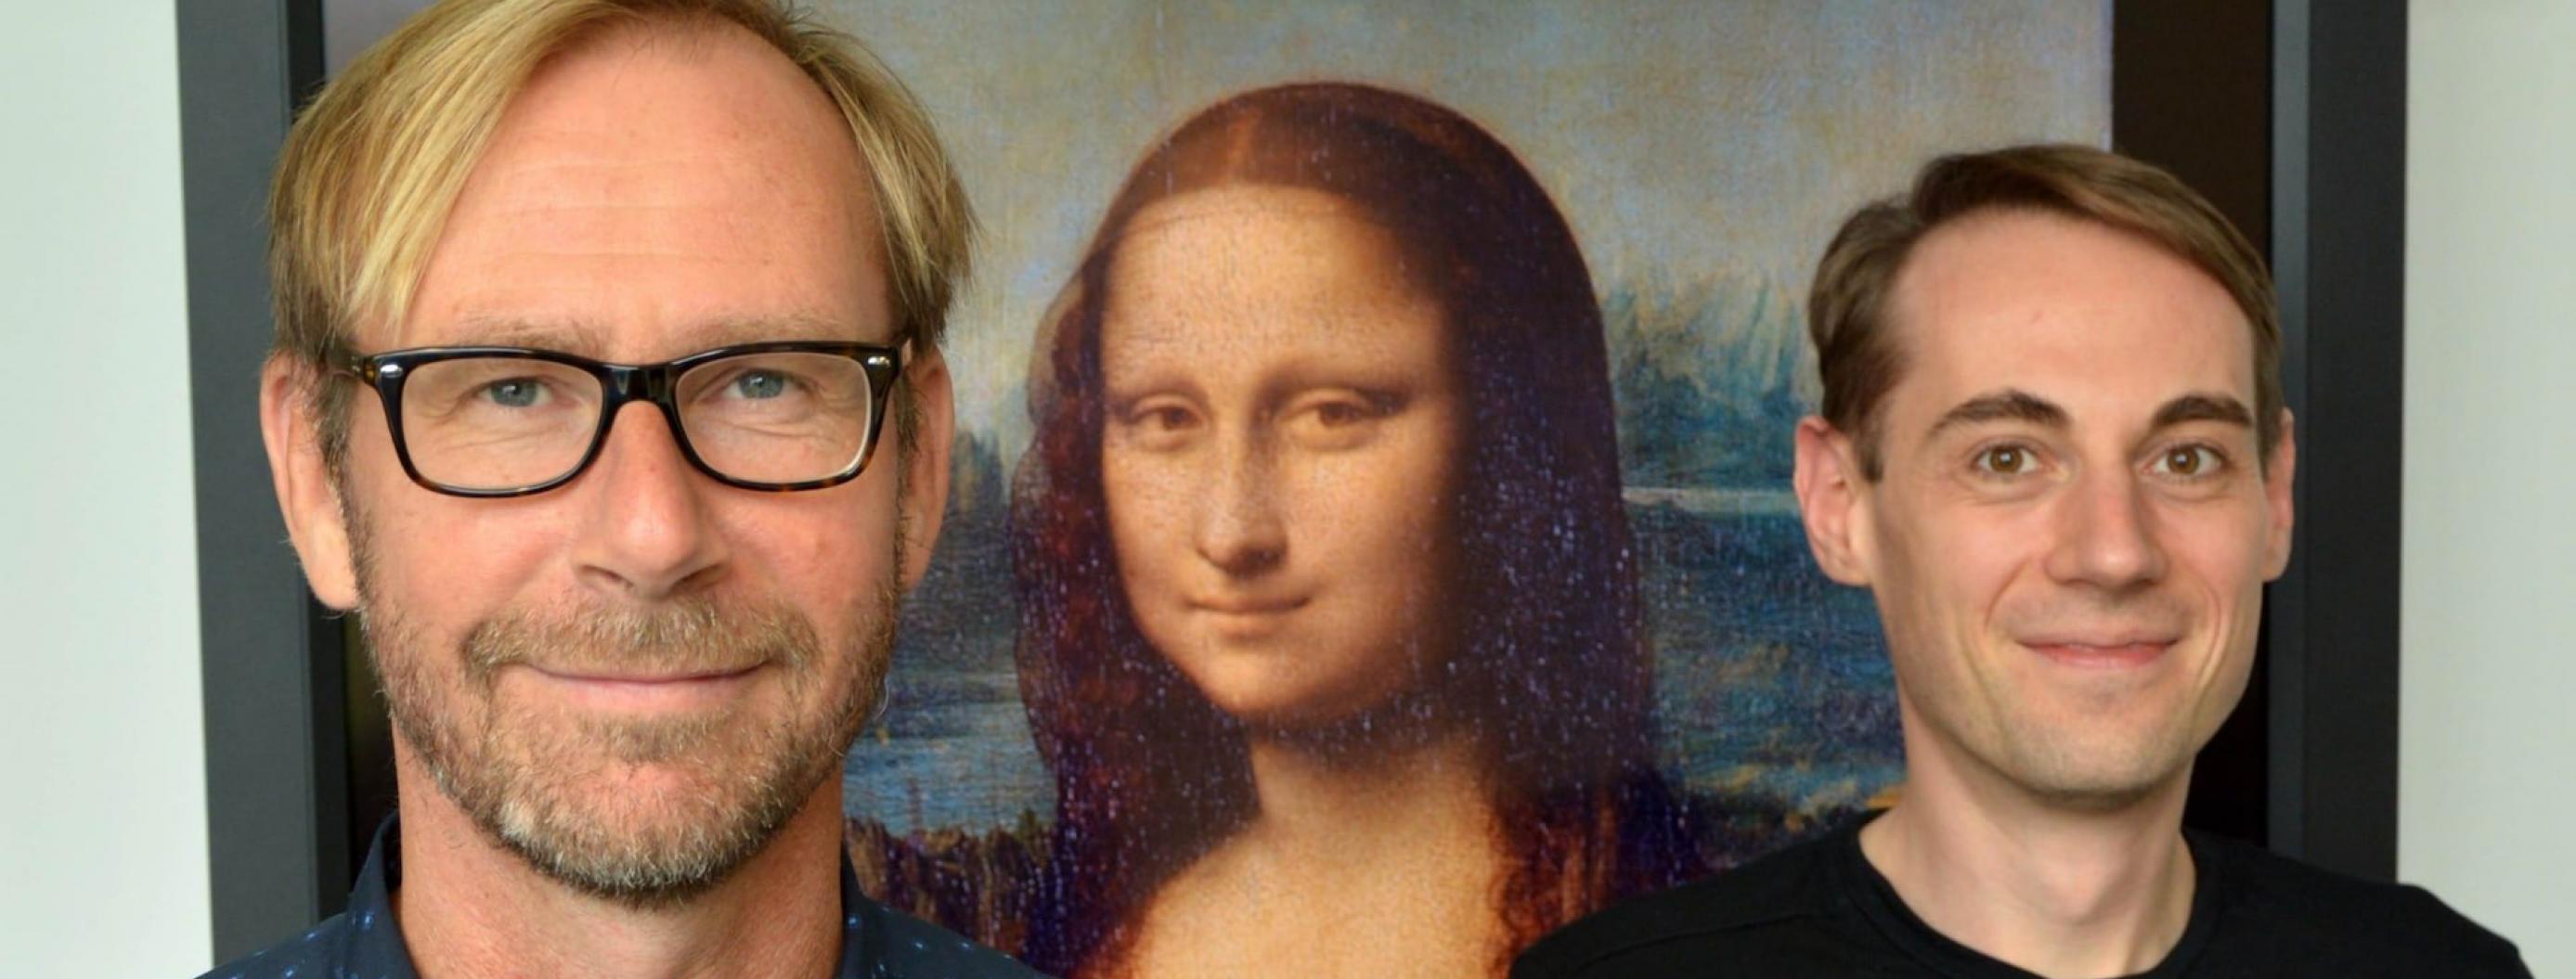 Scientists Debunk the Myth of Mona Lisa's Eyes